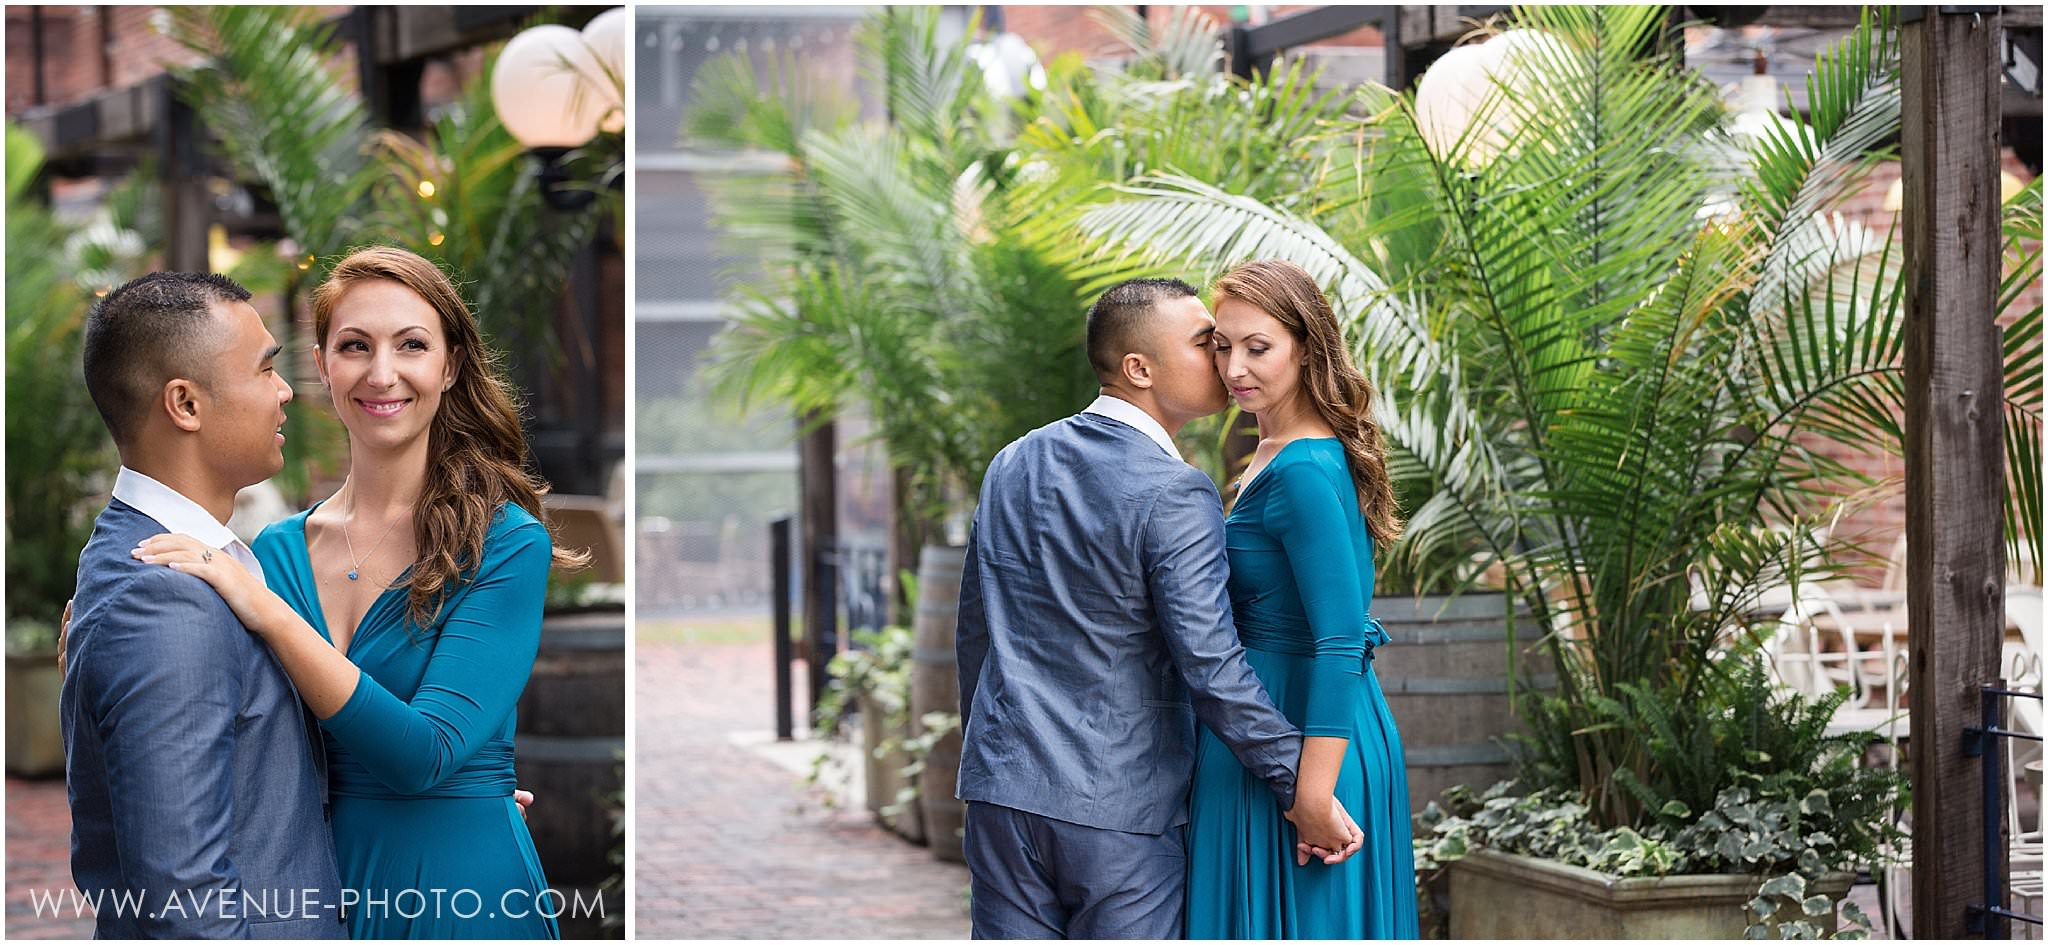 Distillery District Engagement Photos - Cluny Bistro Engagement - Toronto Wedding Photographer